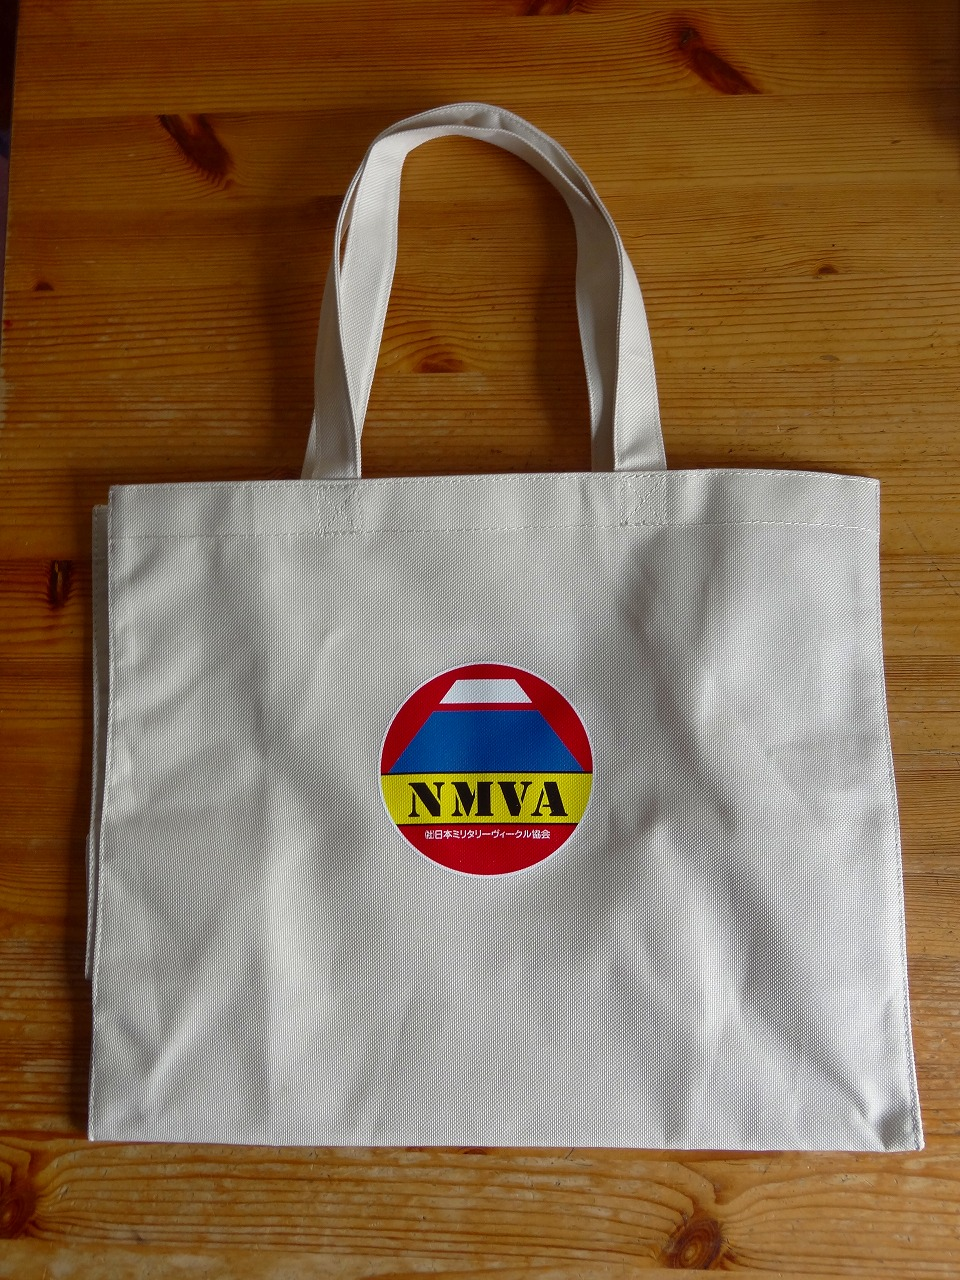 NMVAオリジナルマルチトートバック